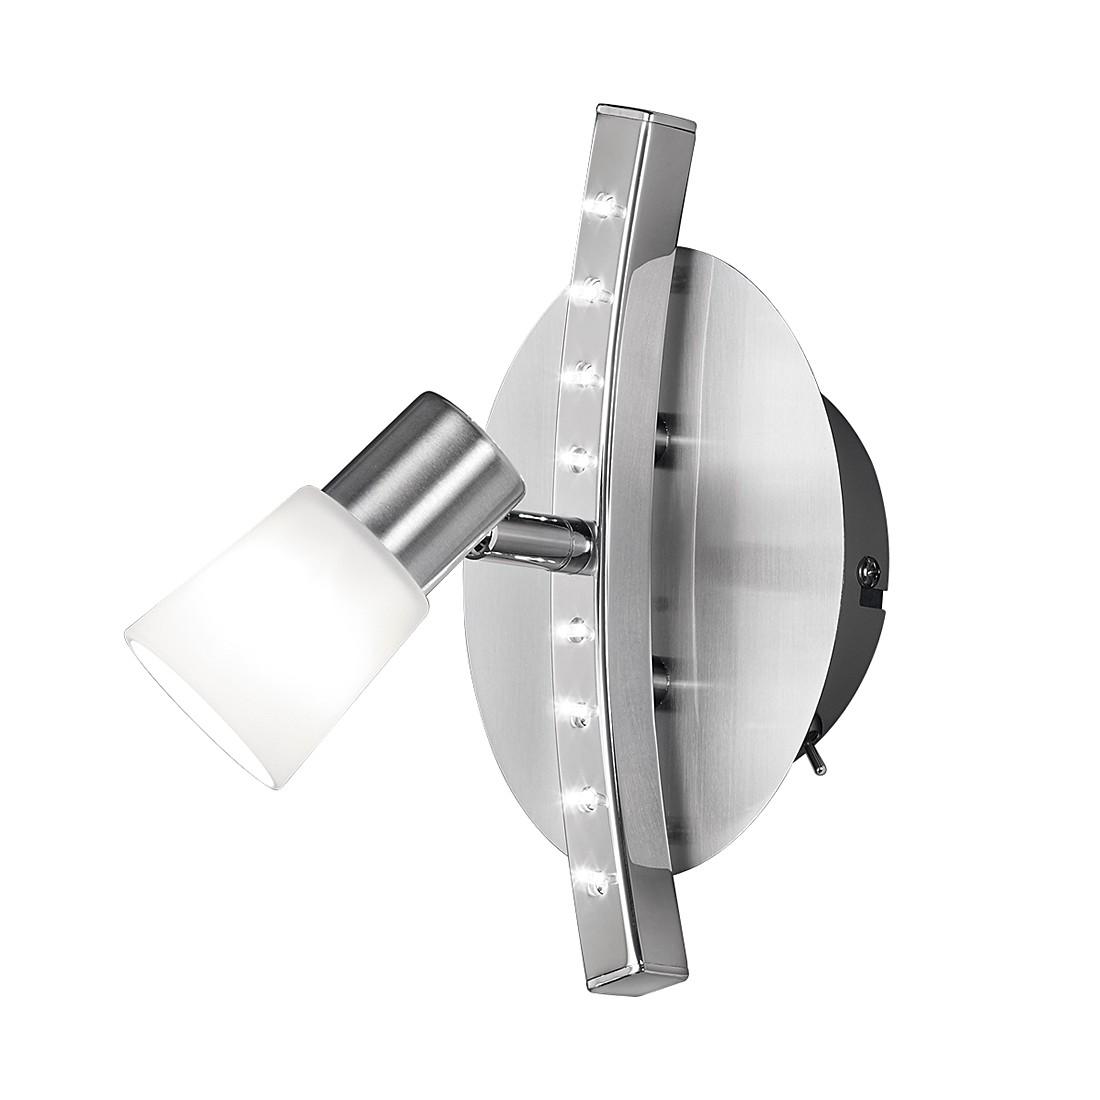 EEK A+, LED-Spot – 1-flammig, Trio günstig bestellen